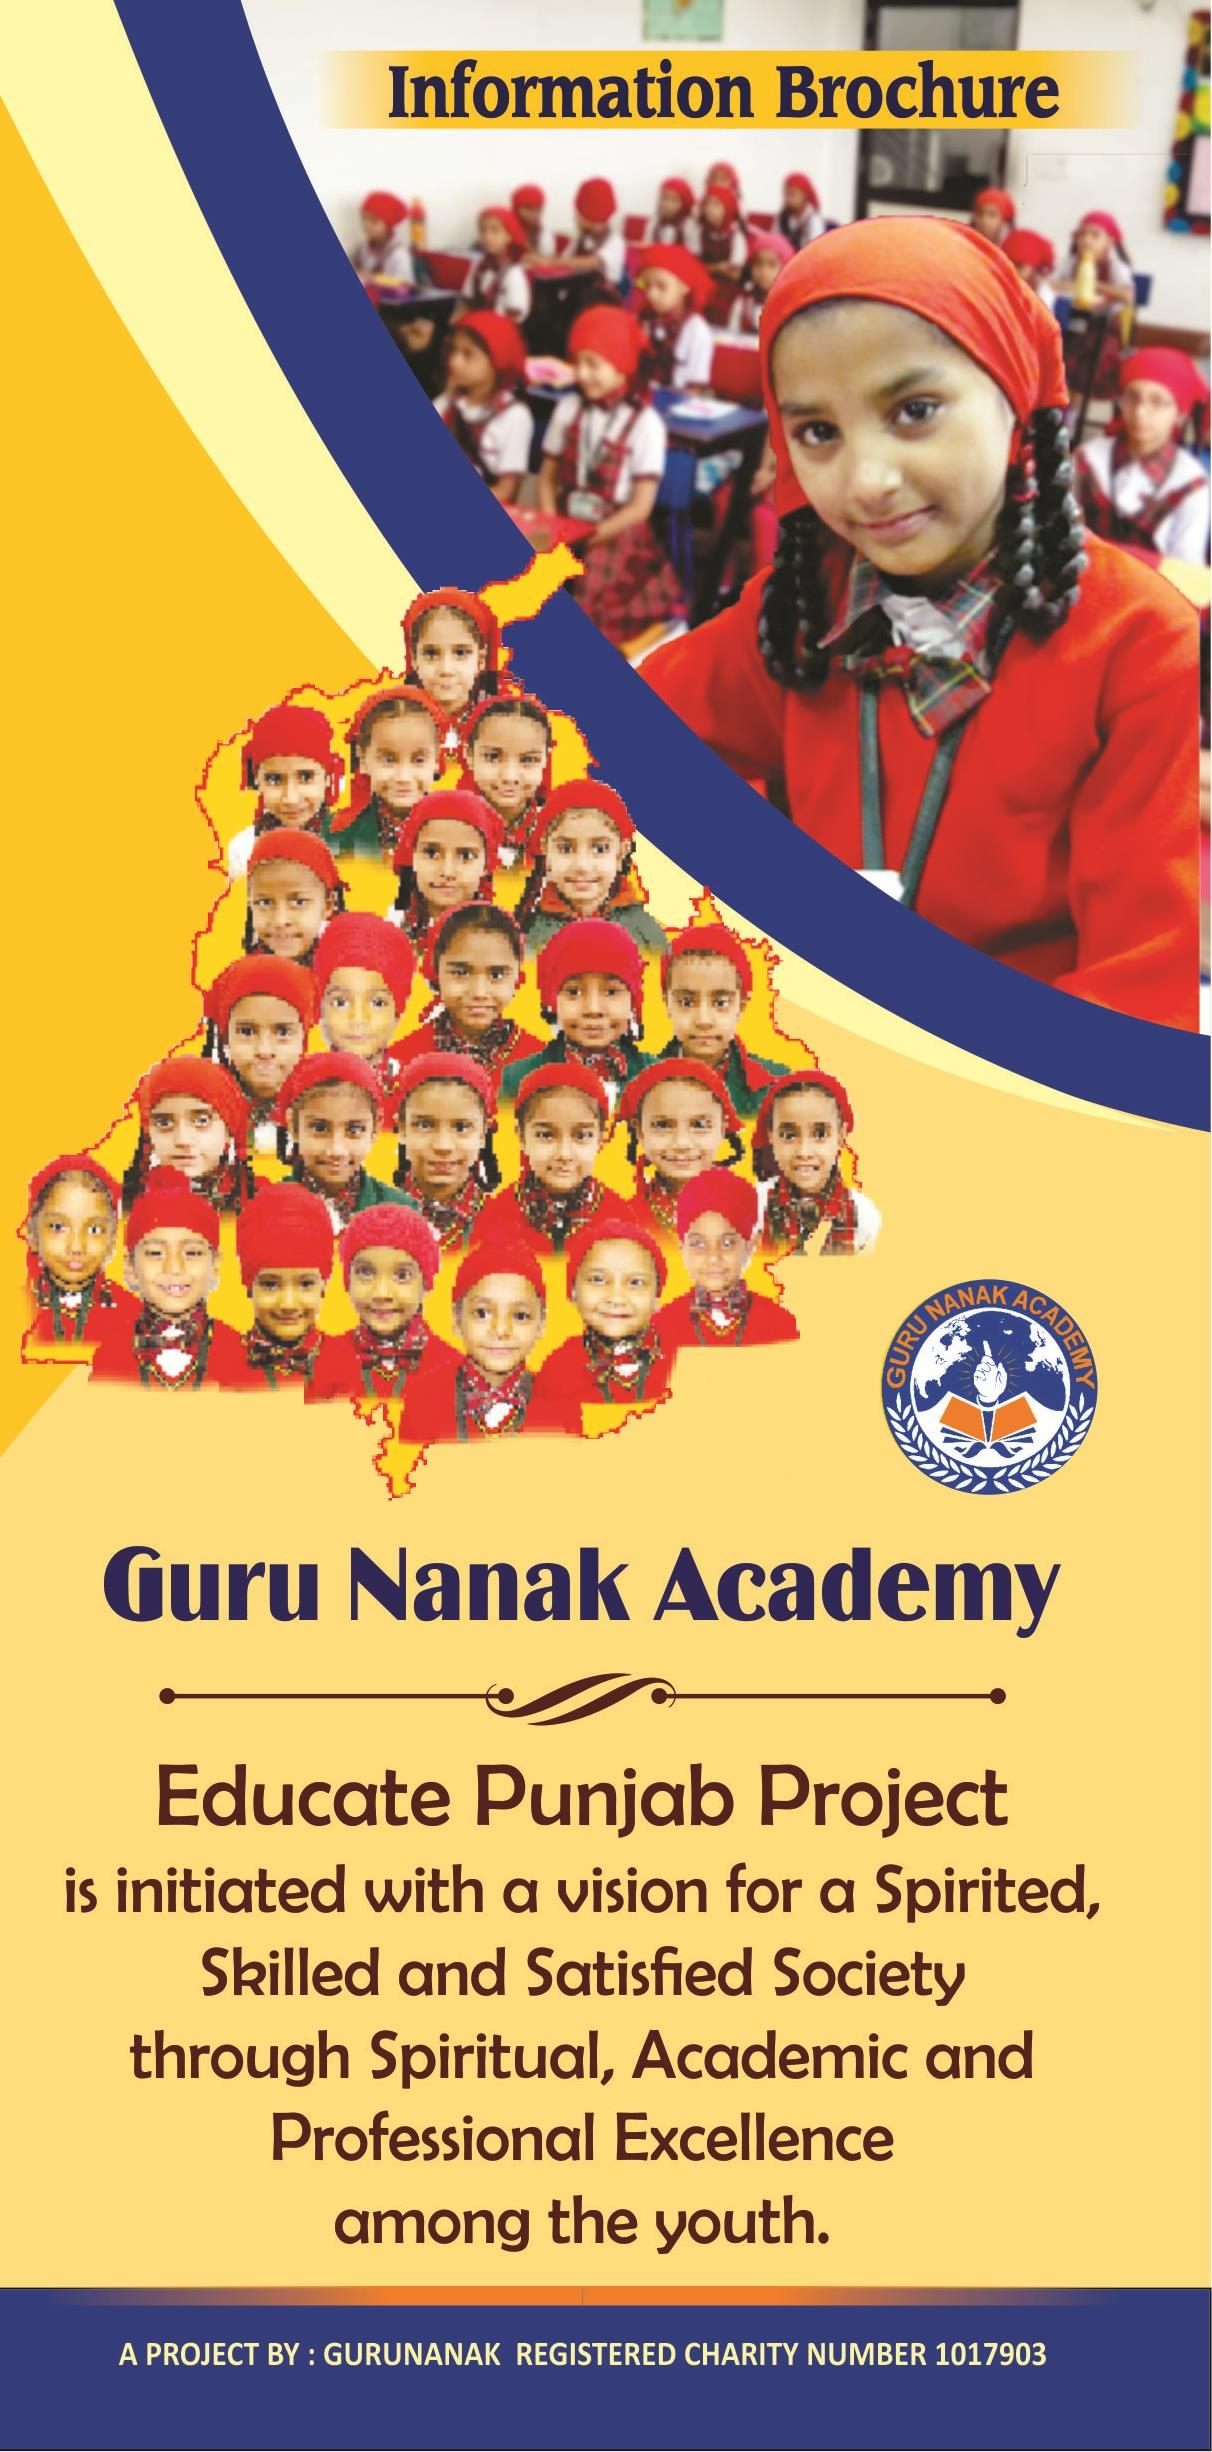 Guru Nanak Academy - Information Brochure